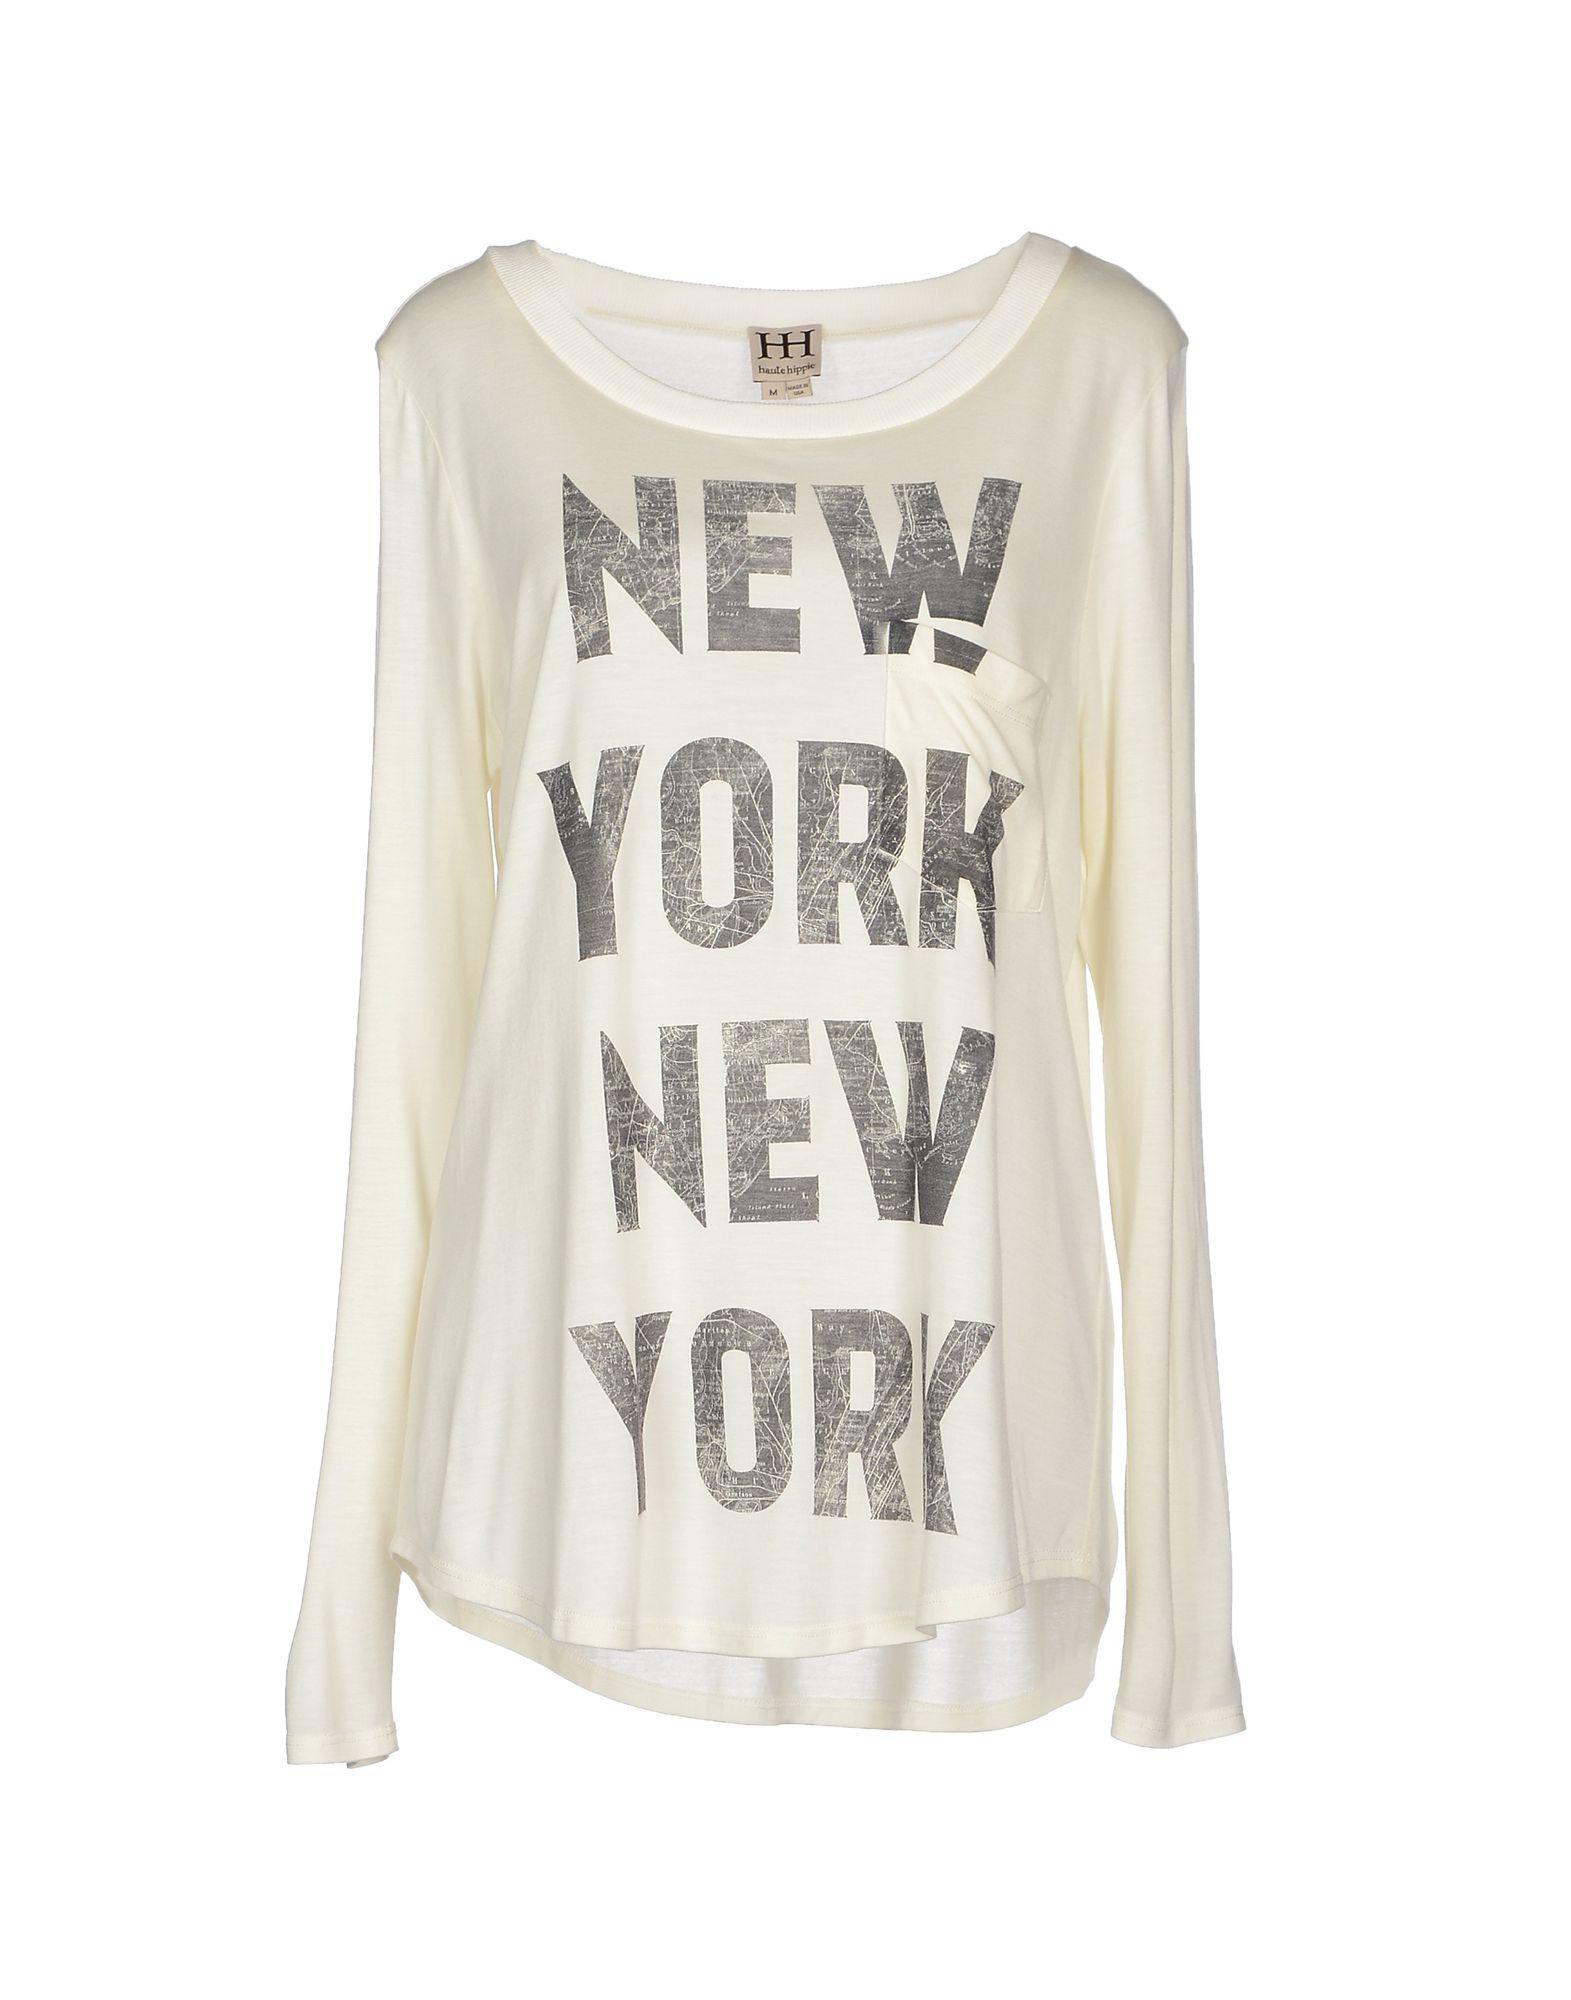 Lyst haute hippie t shirt in white for Hippie t shirts australia